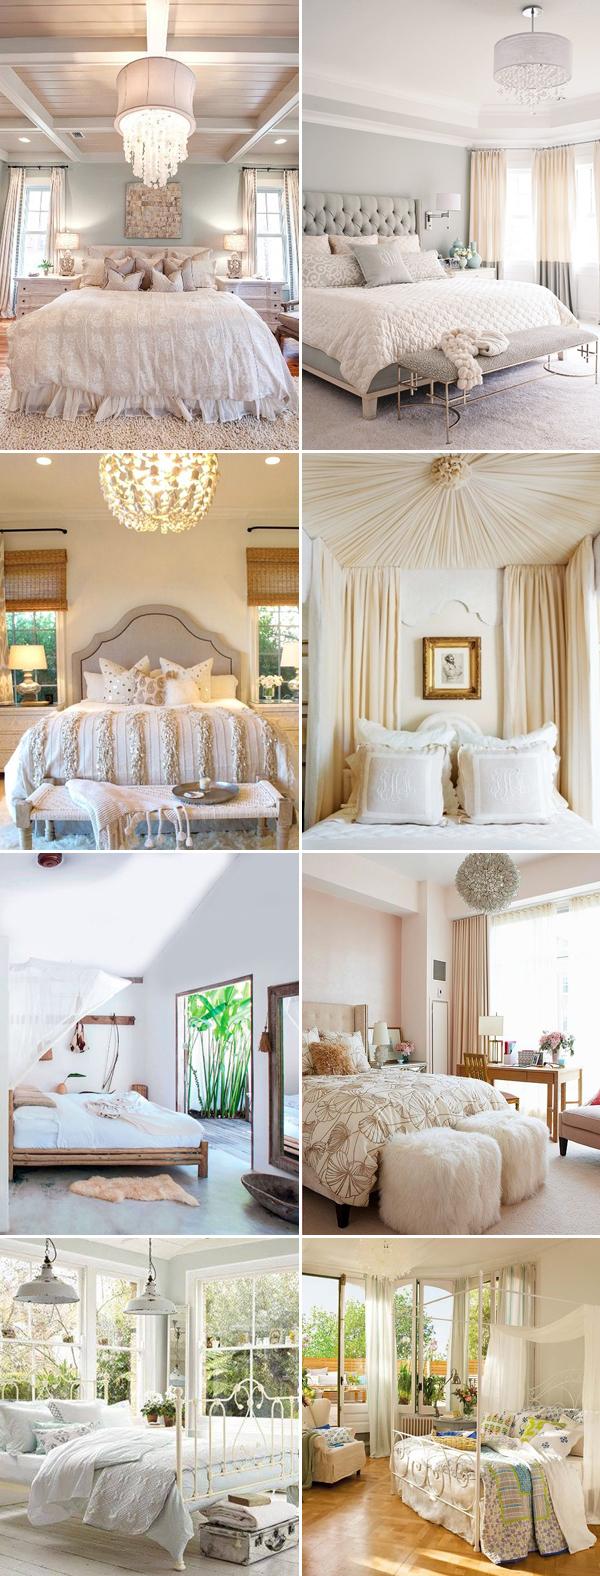 bedroom03-serene